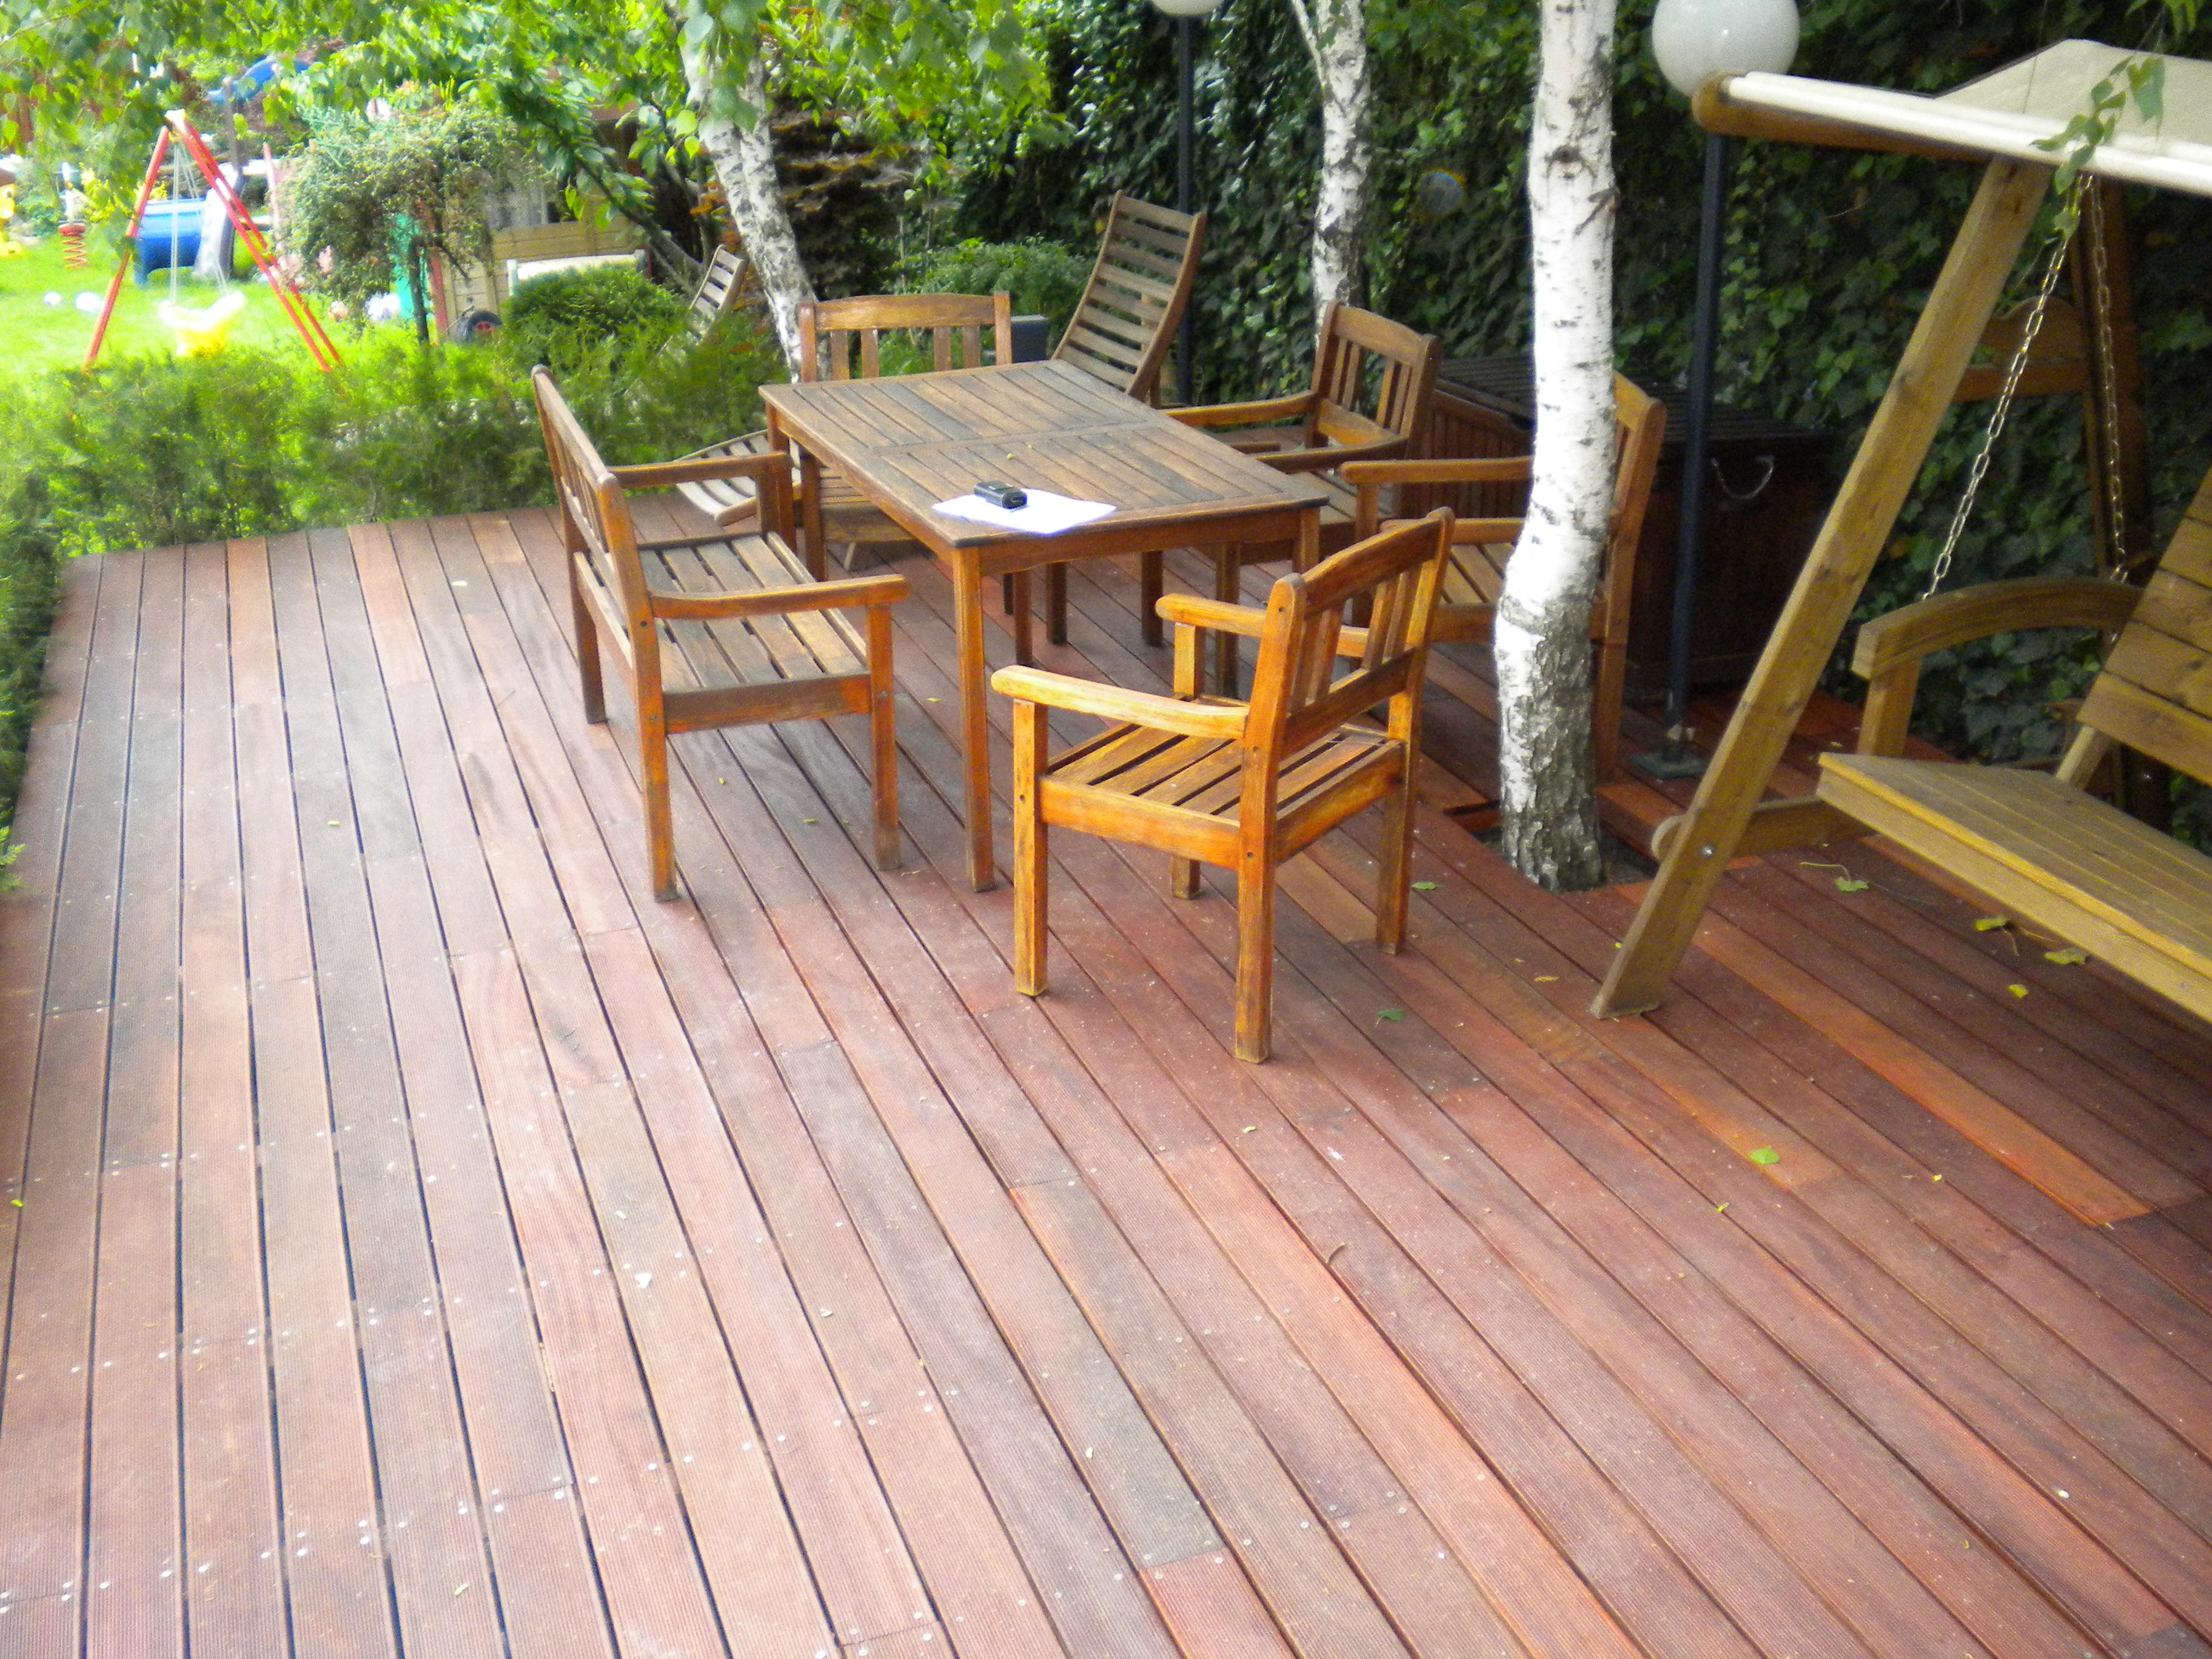 Deck-uri lemn - Uxi SELVA FLOORS - Poza 1